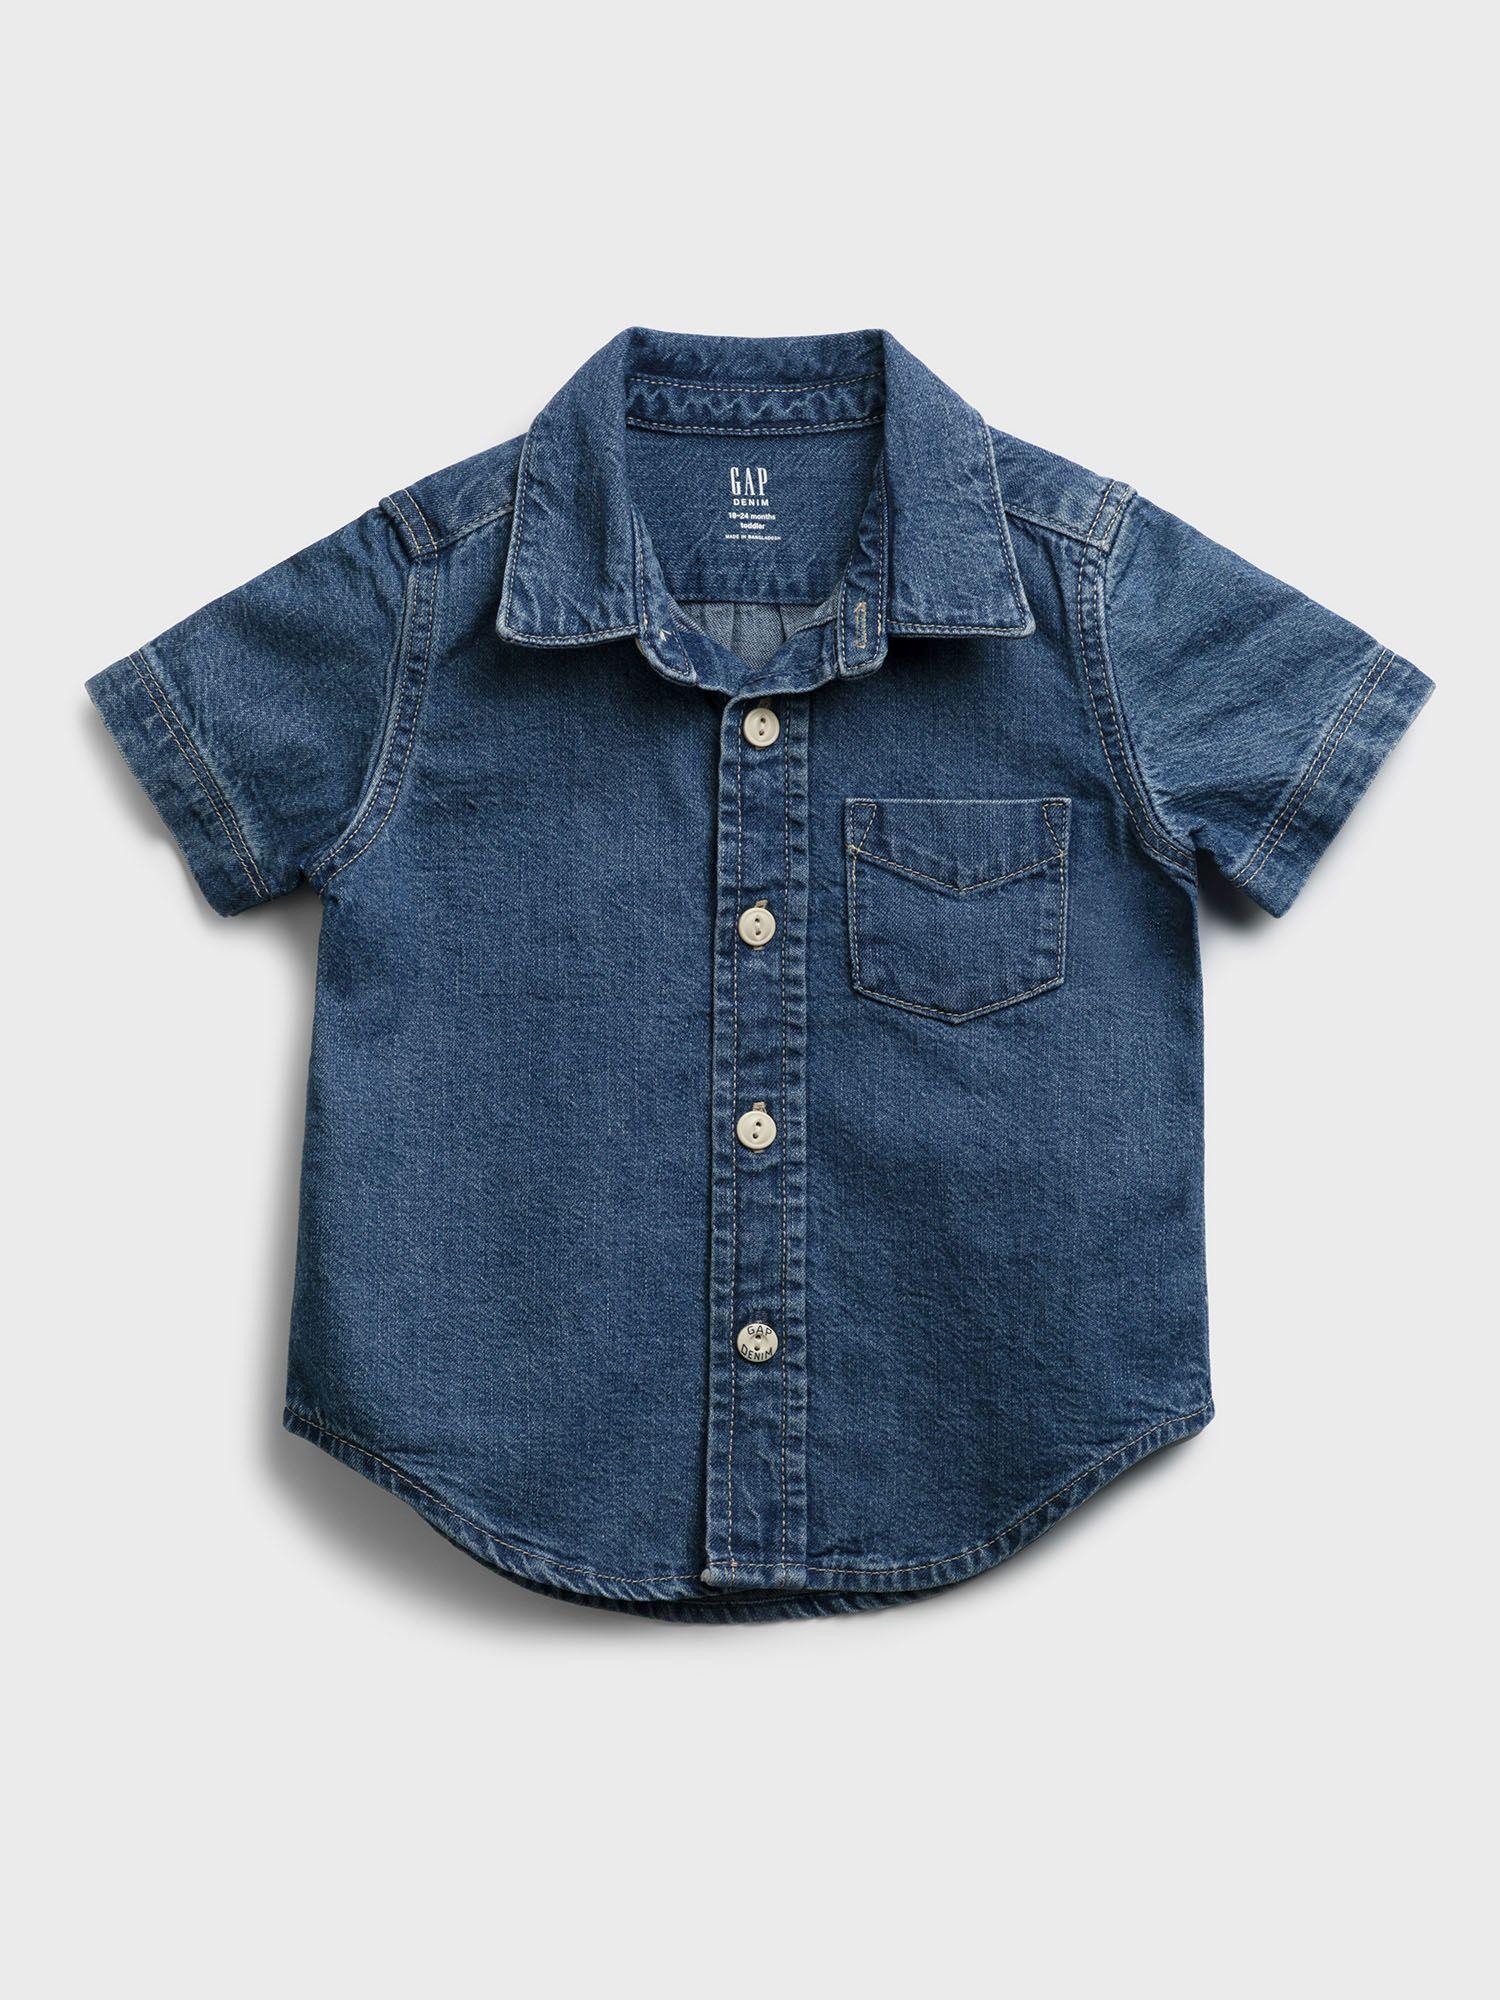 GAP Kids Shirt Blue